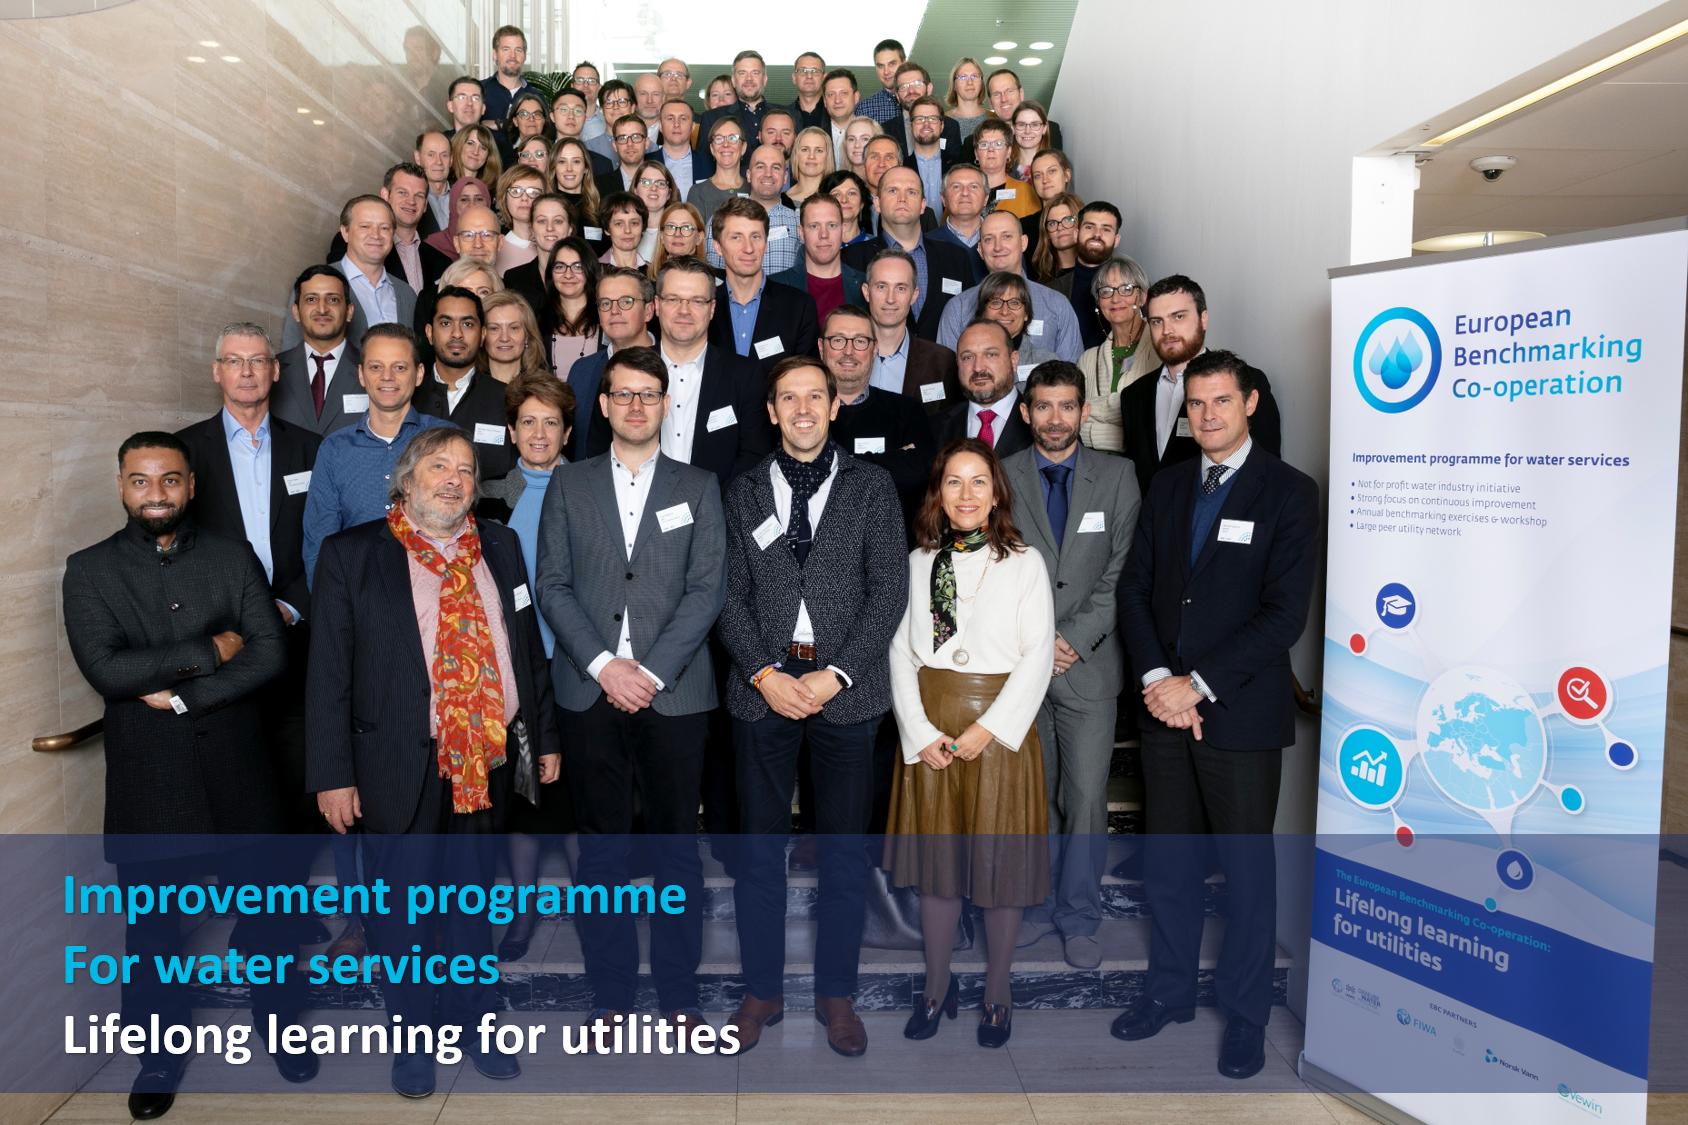 Participants IB2018 benchmarking workshop Helsinki, Finland